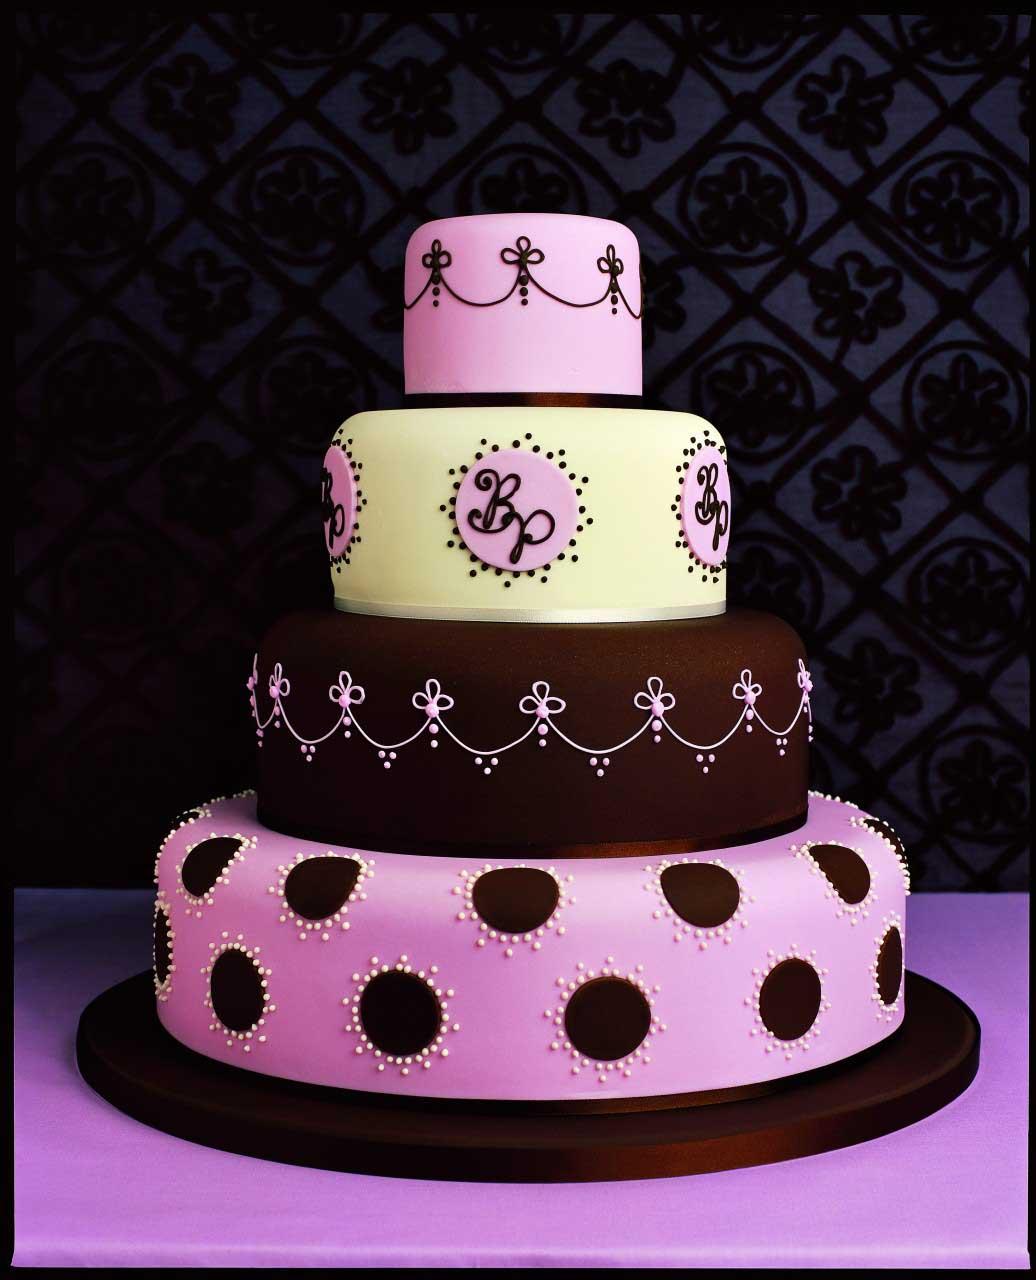 Latest Wedding Cake Designs Starsricha